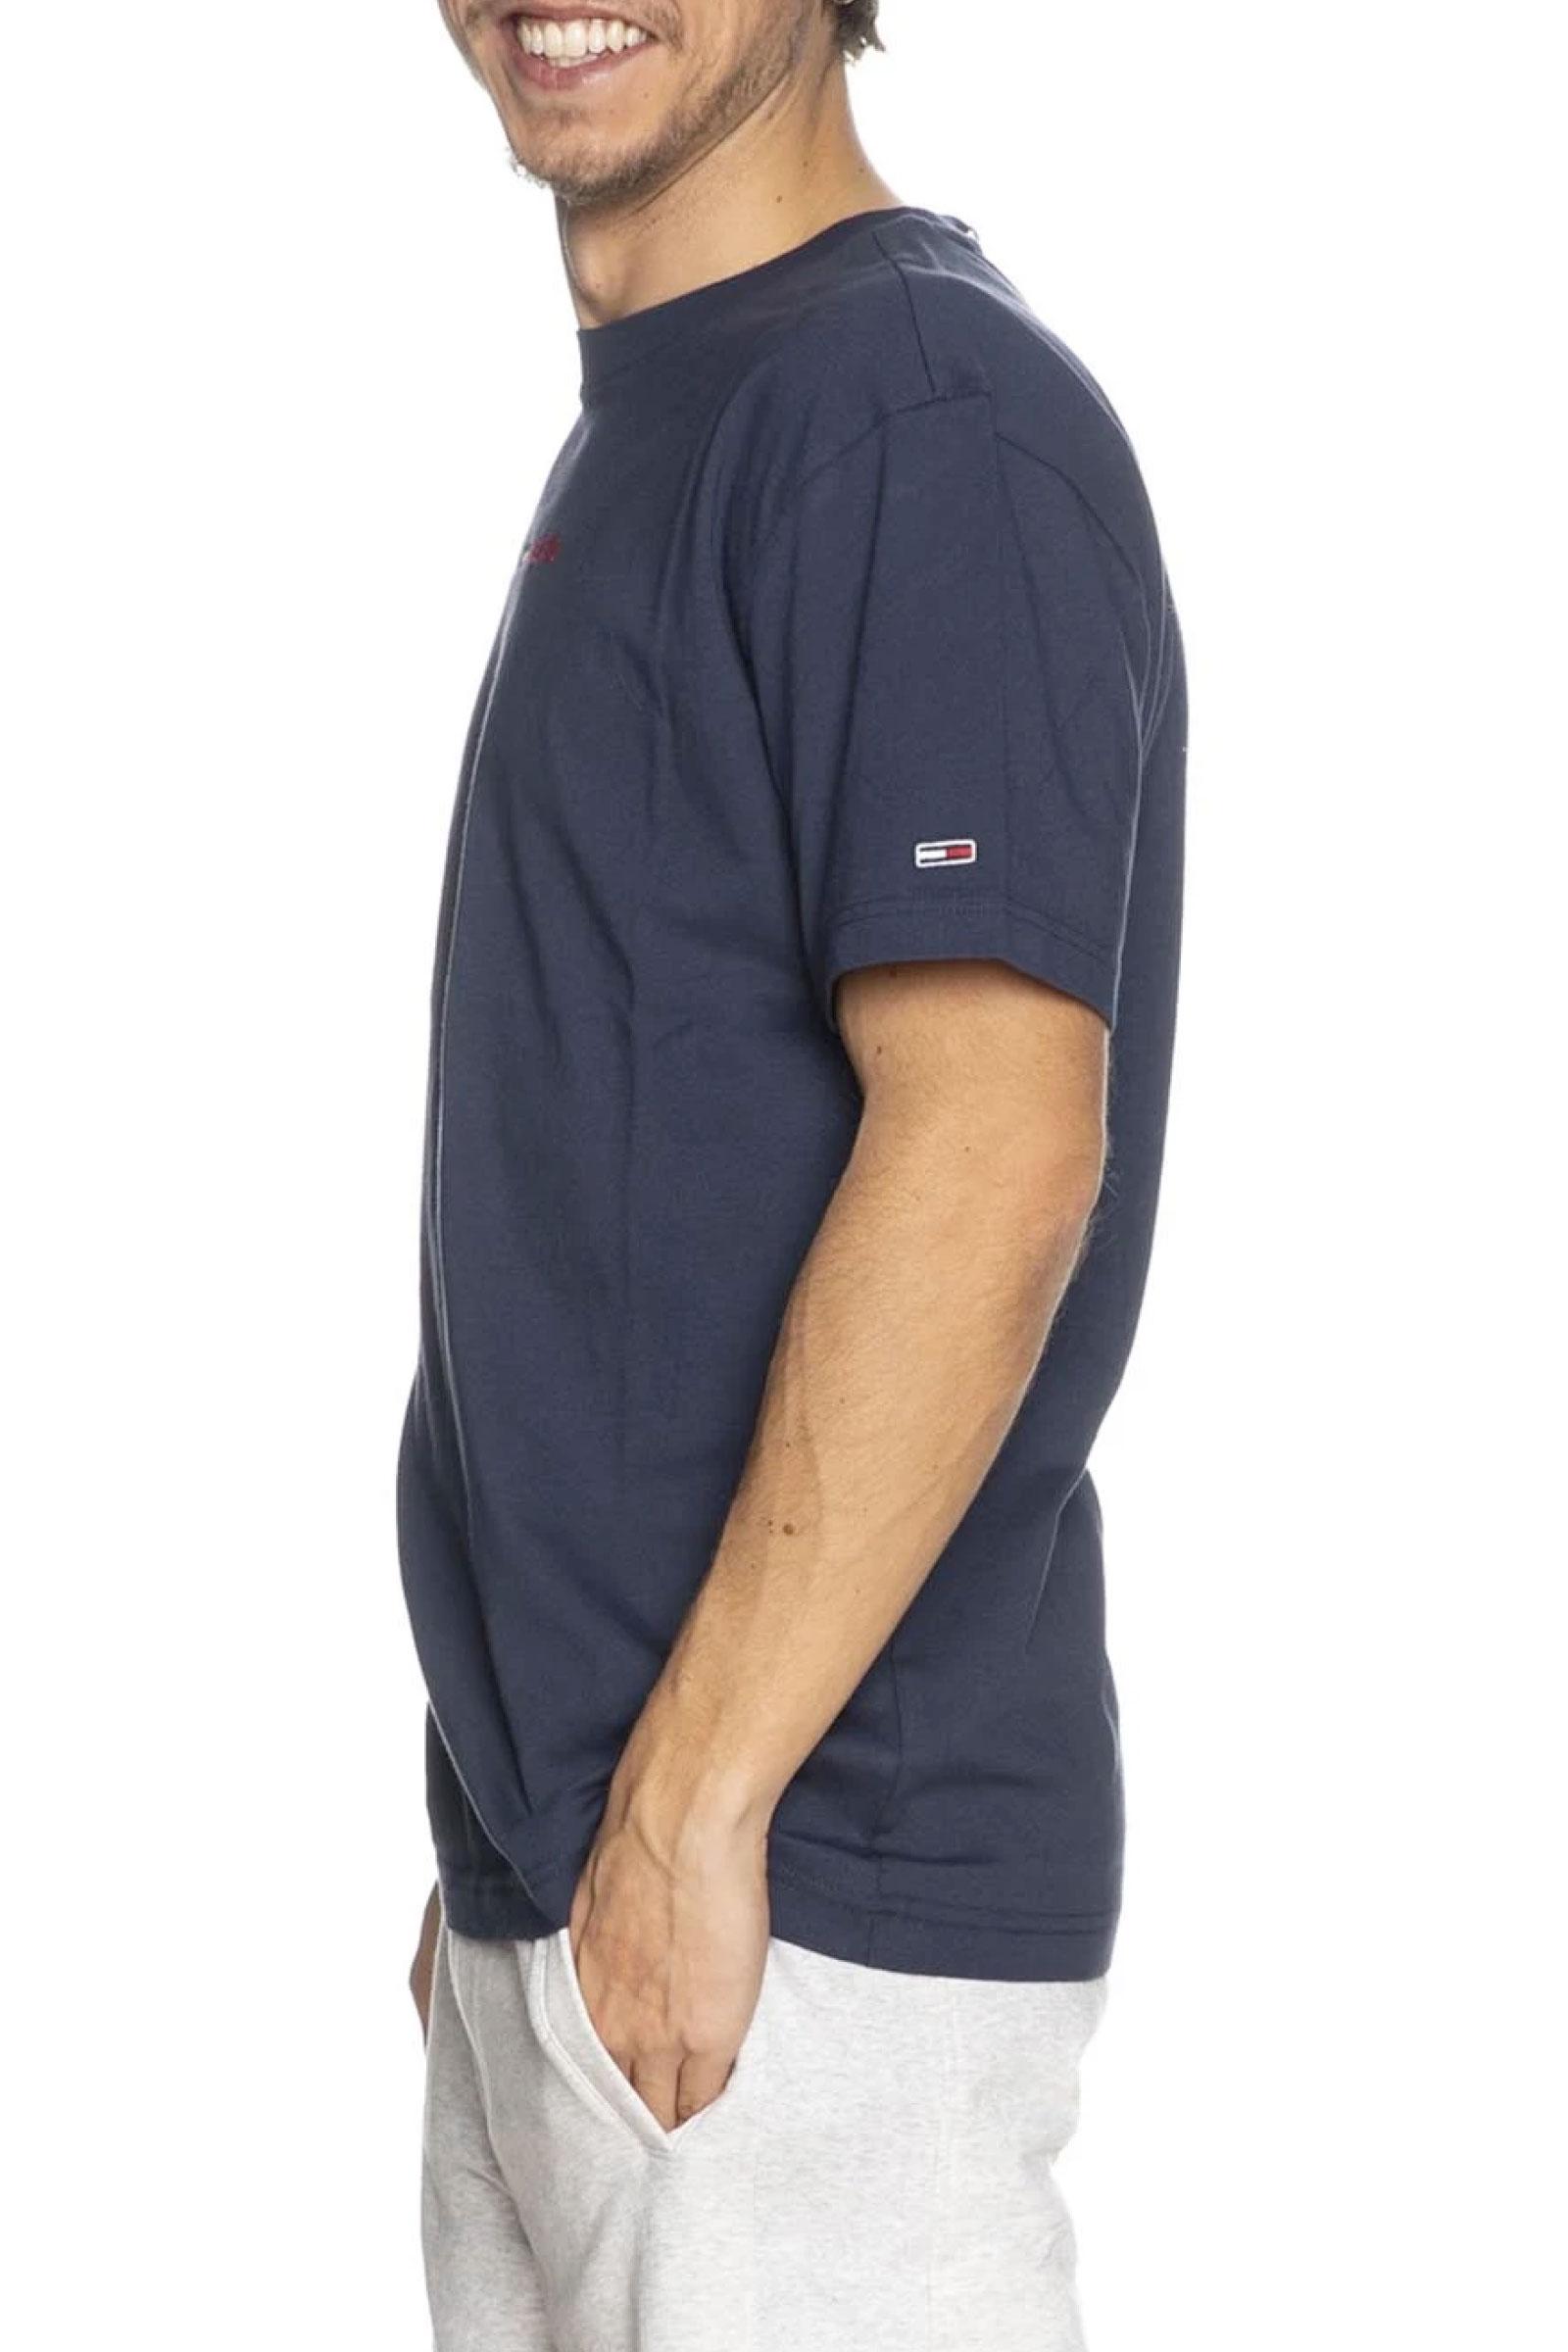 TOMMY JEANS T-Shirt Uomo TOMMY JEANS | T-Shirt | DM0DM10219C87